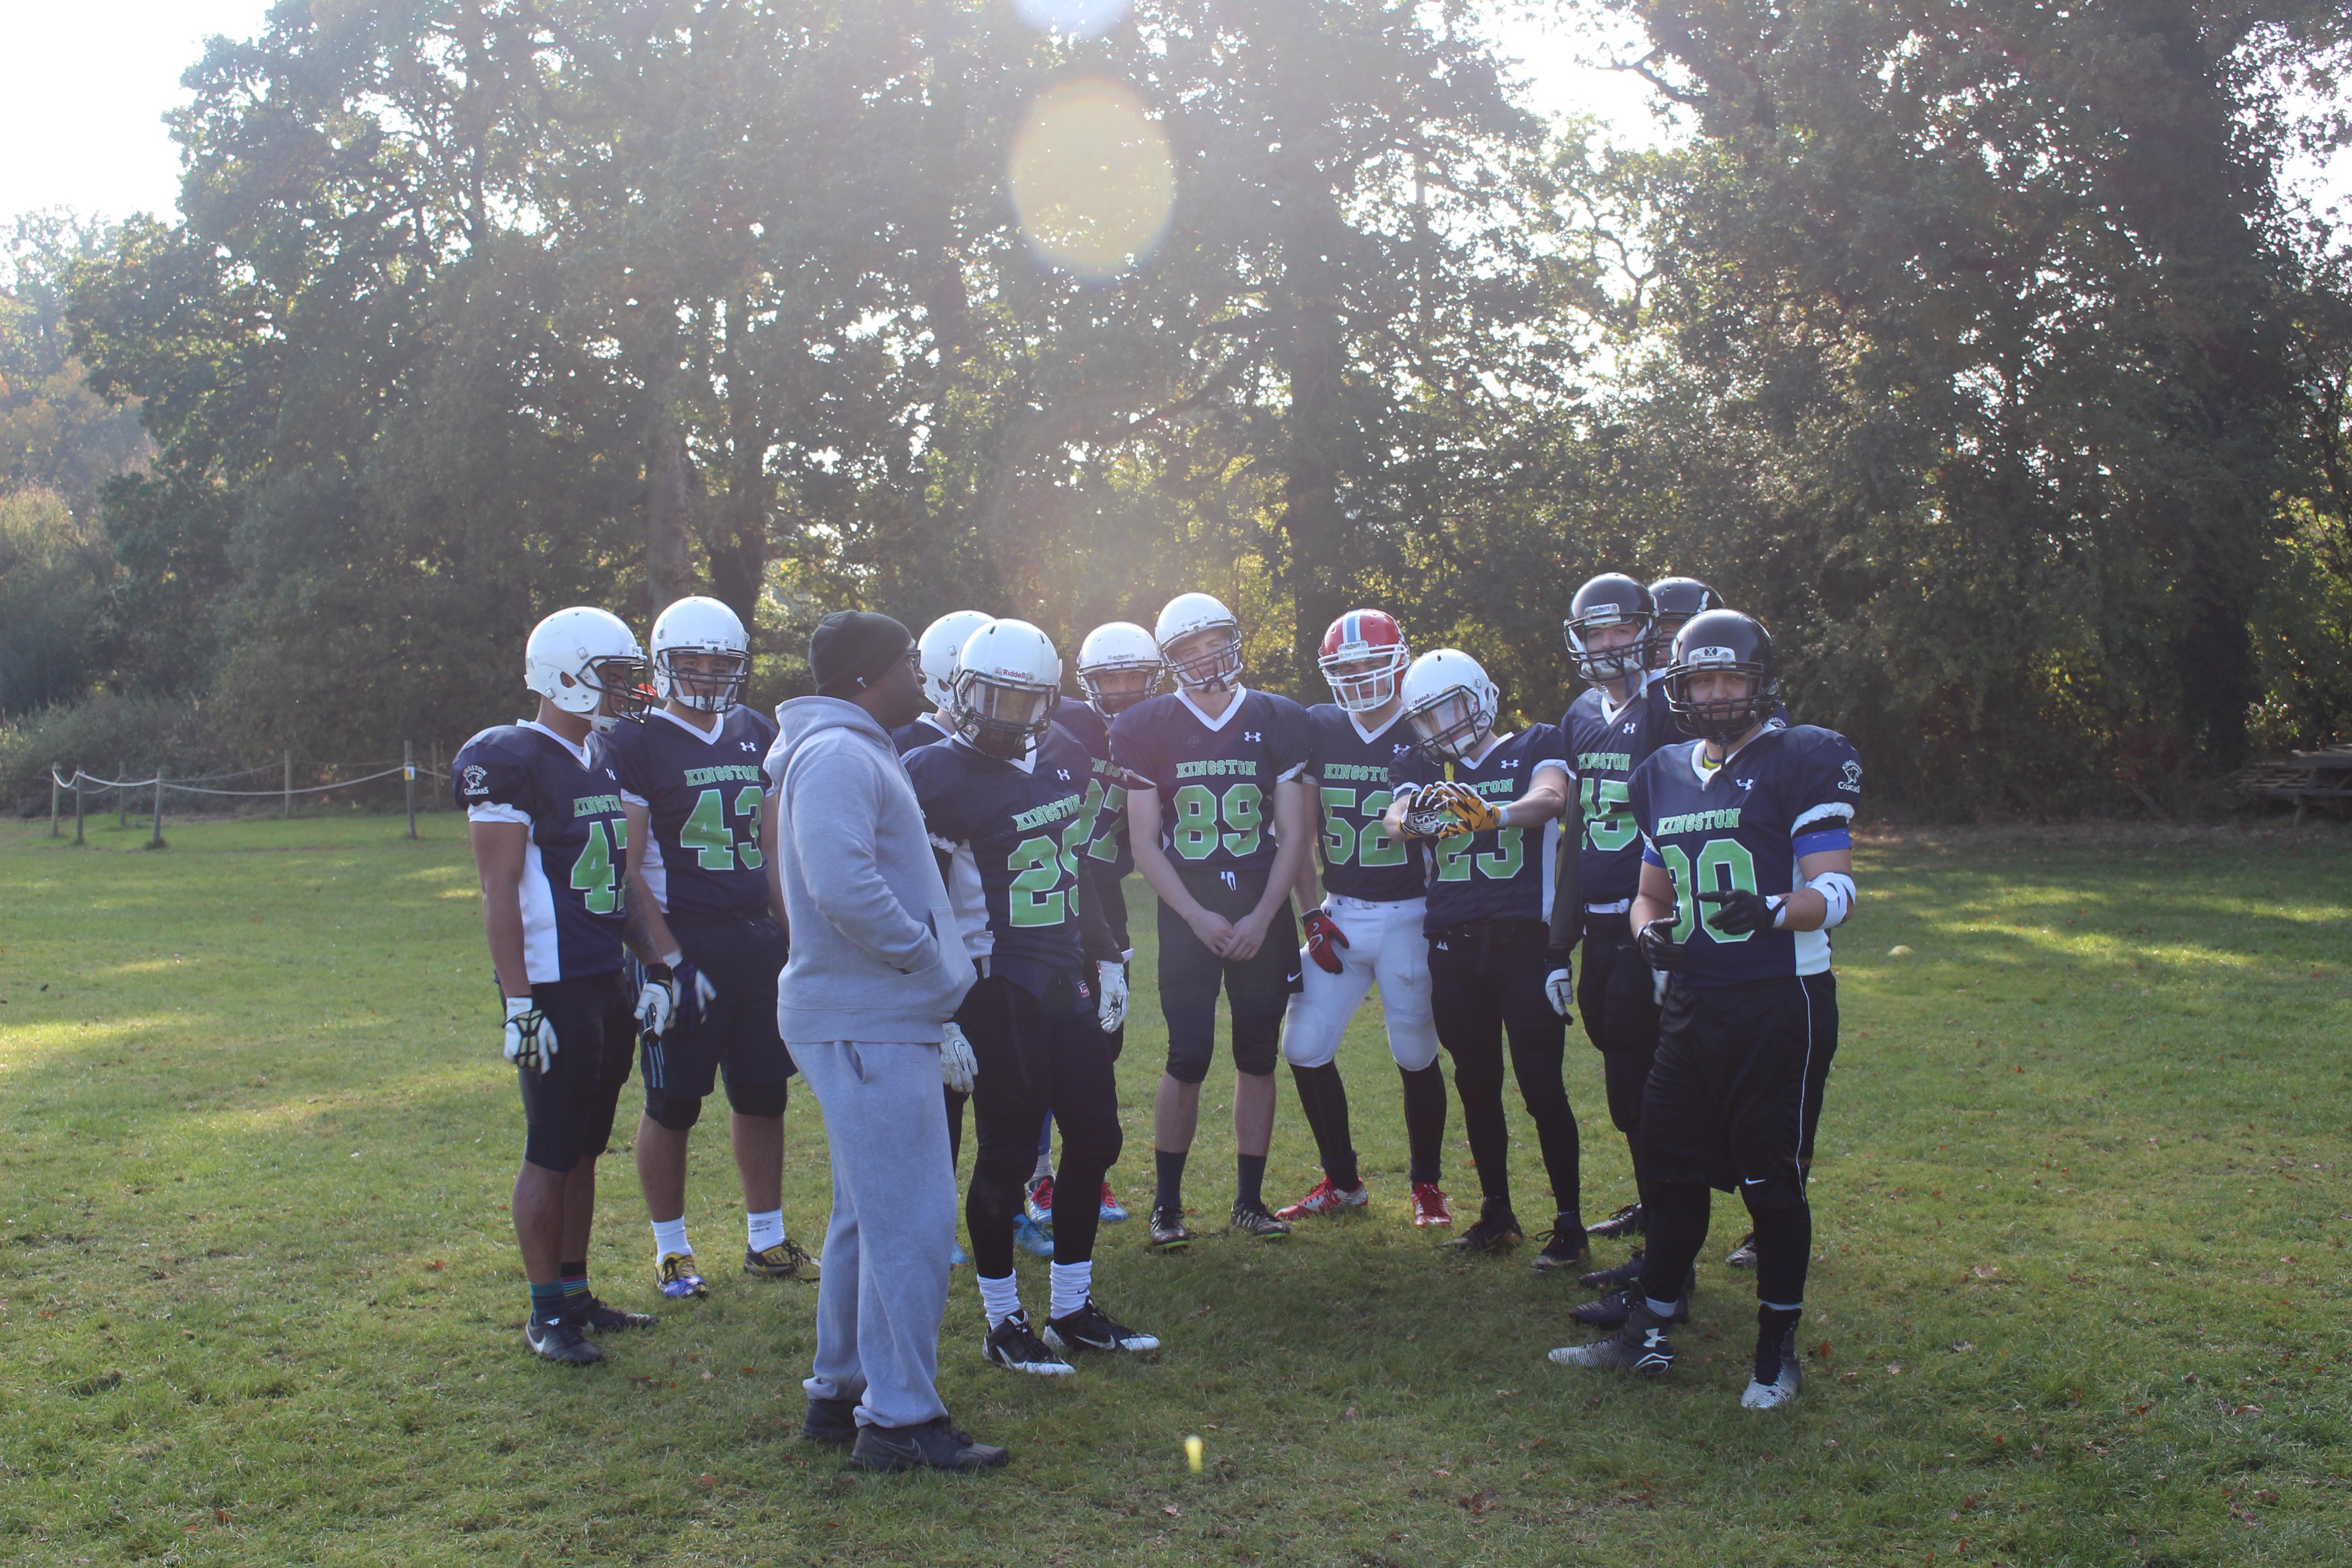 KU American football: A team making history